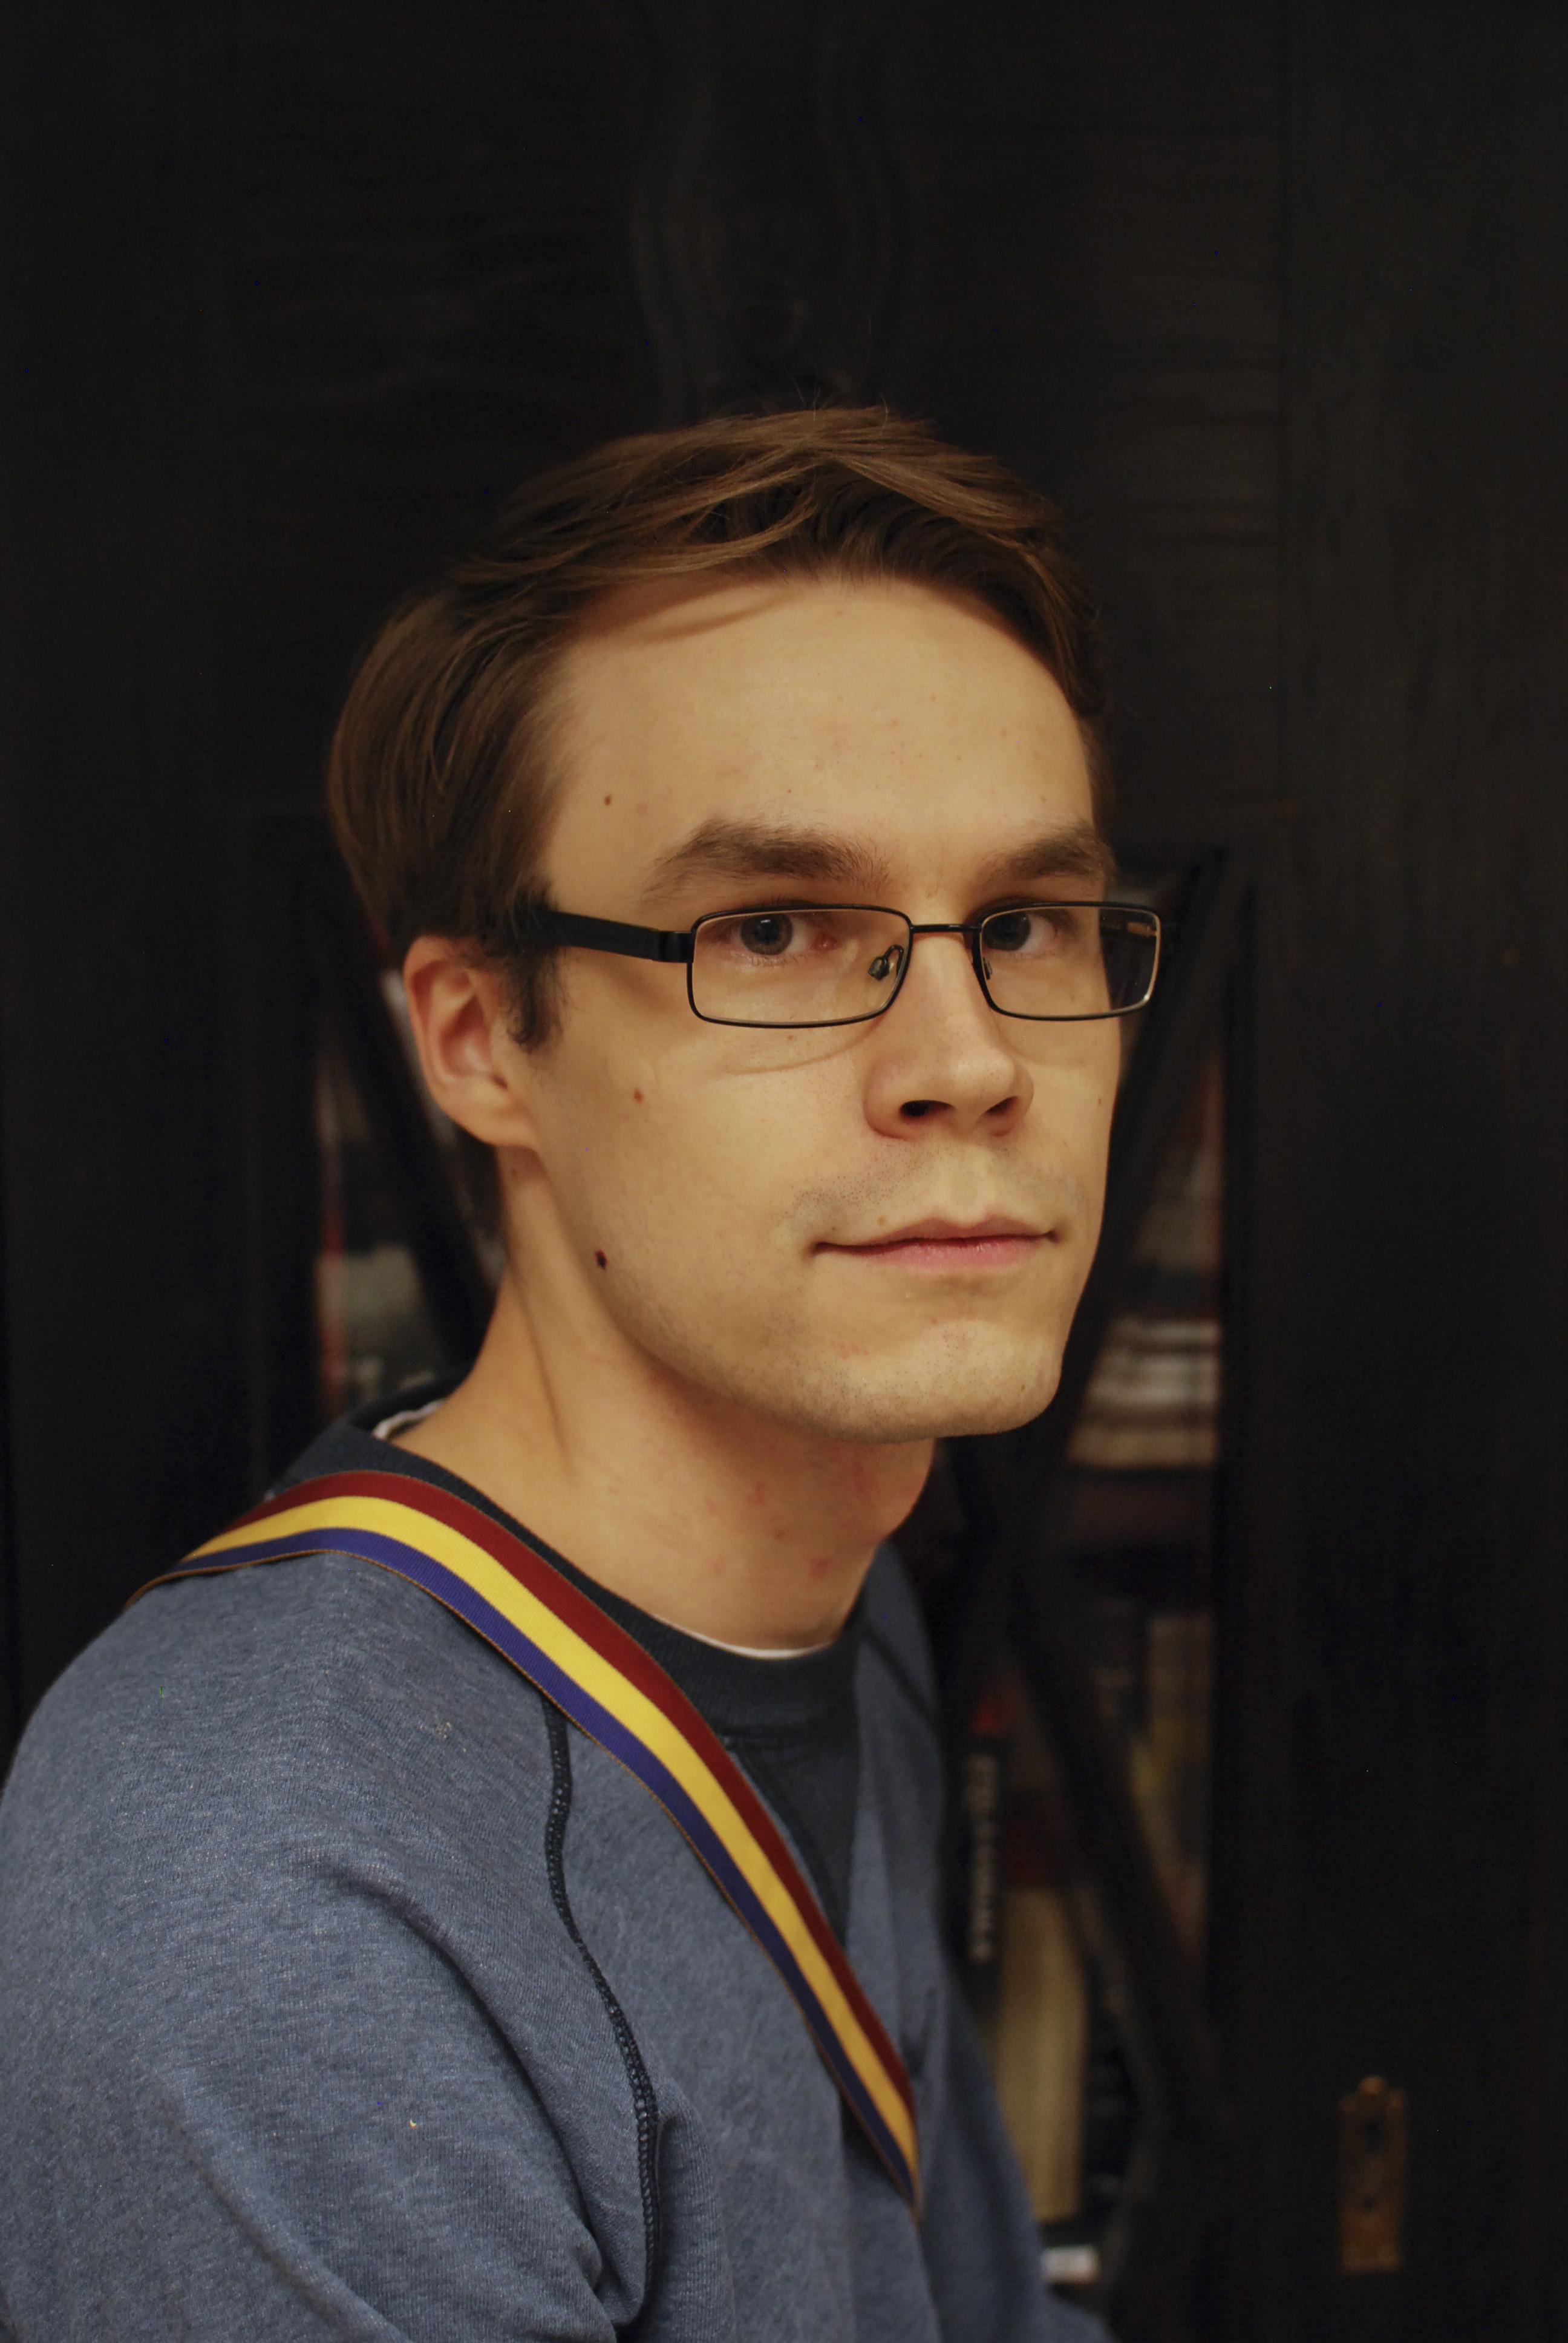 Niklas Nurminen